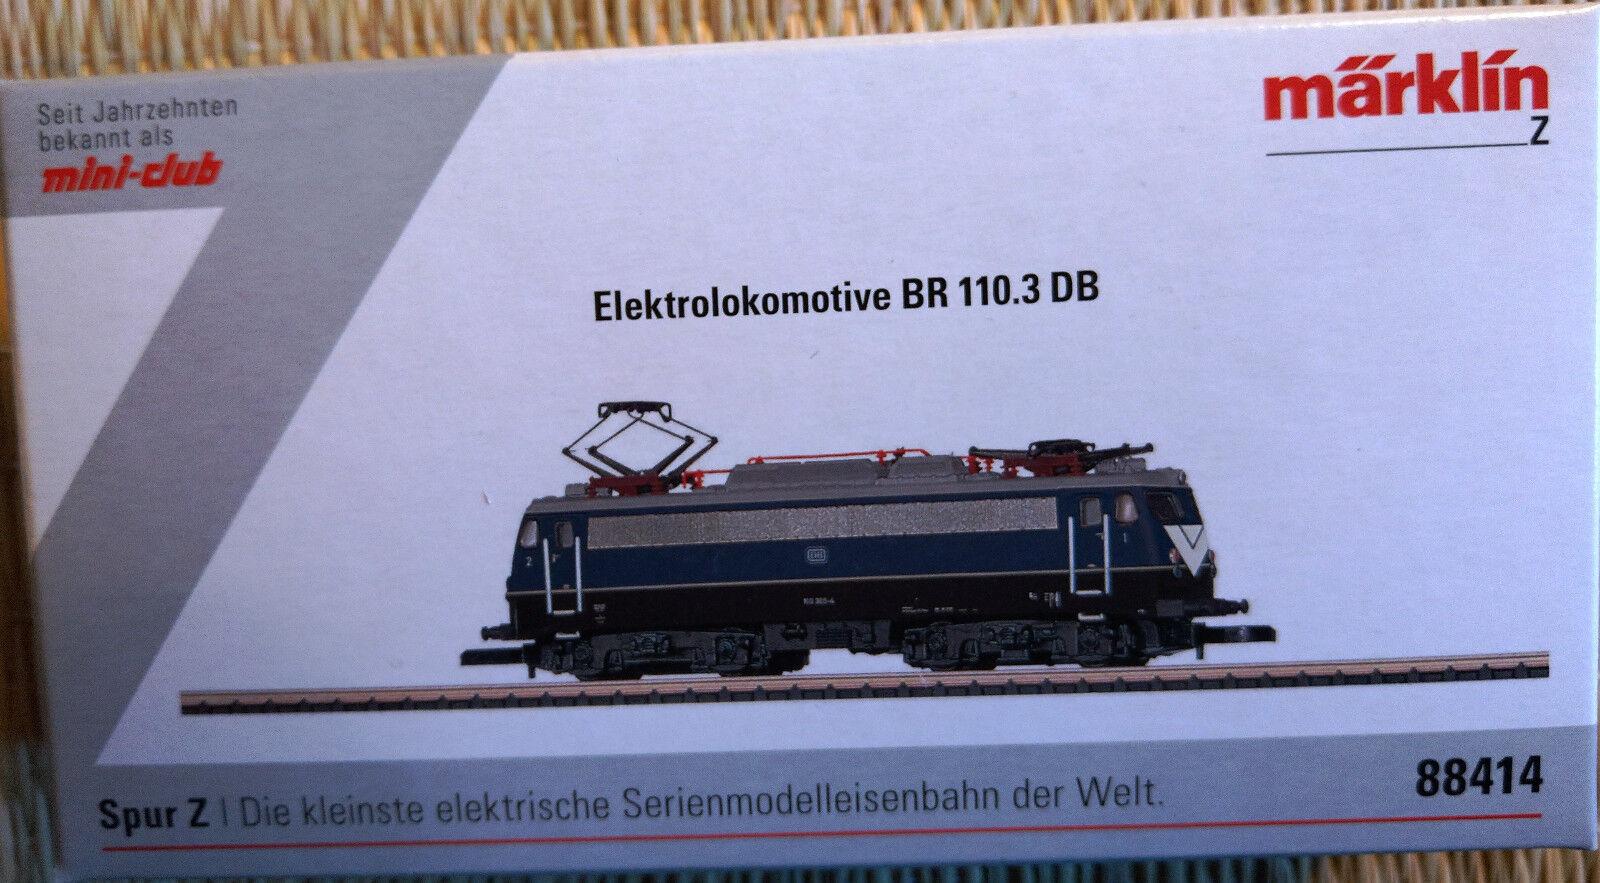 Märklin 88414 elektrolokomotive BR 110.3 DB * piega stiratura * NUOVO